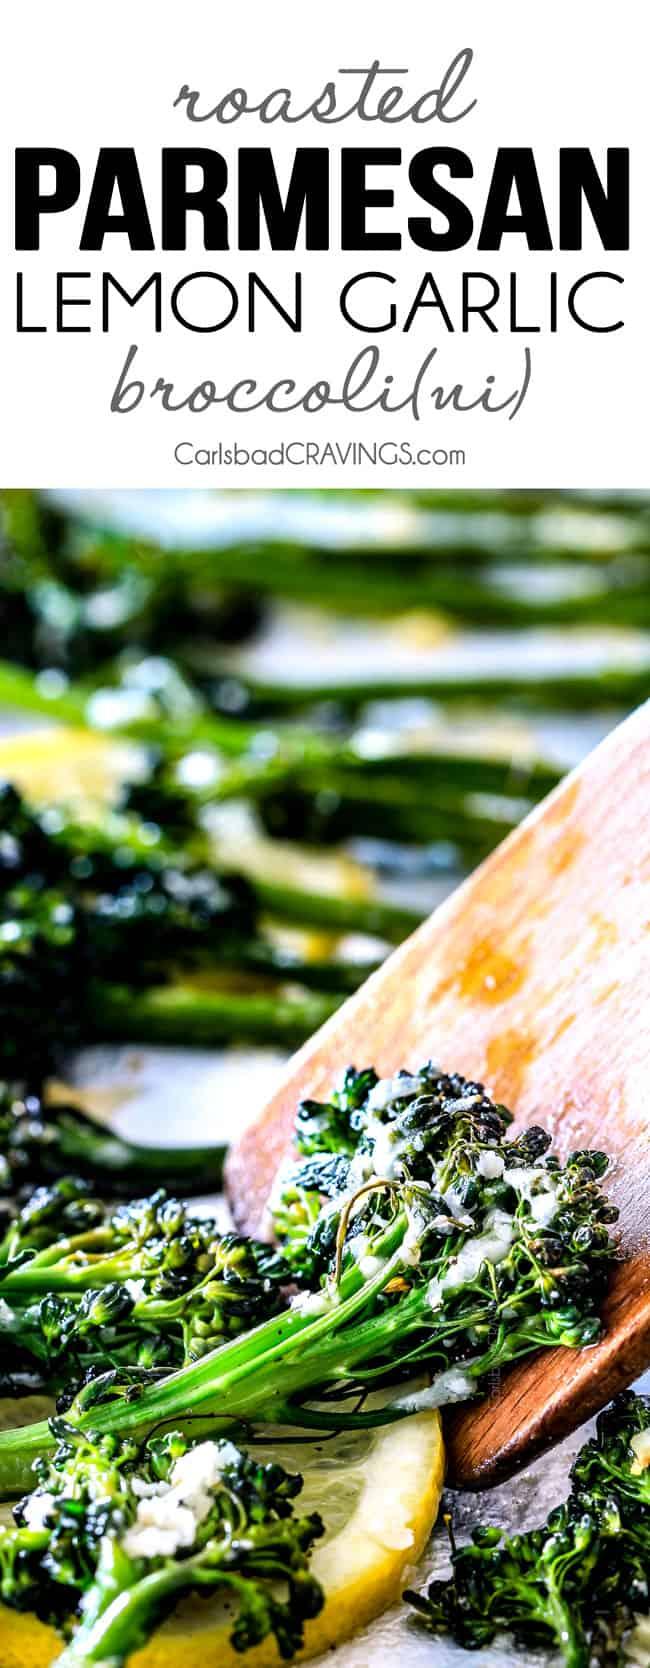 Roasted Parmesan Lemon Garlic Broccoli.